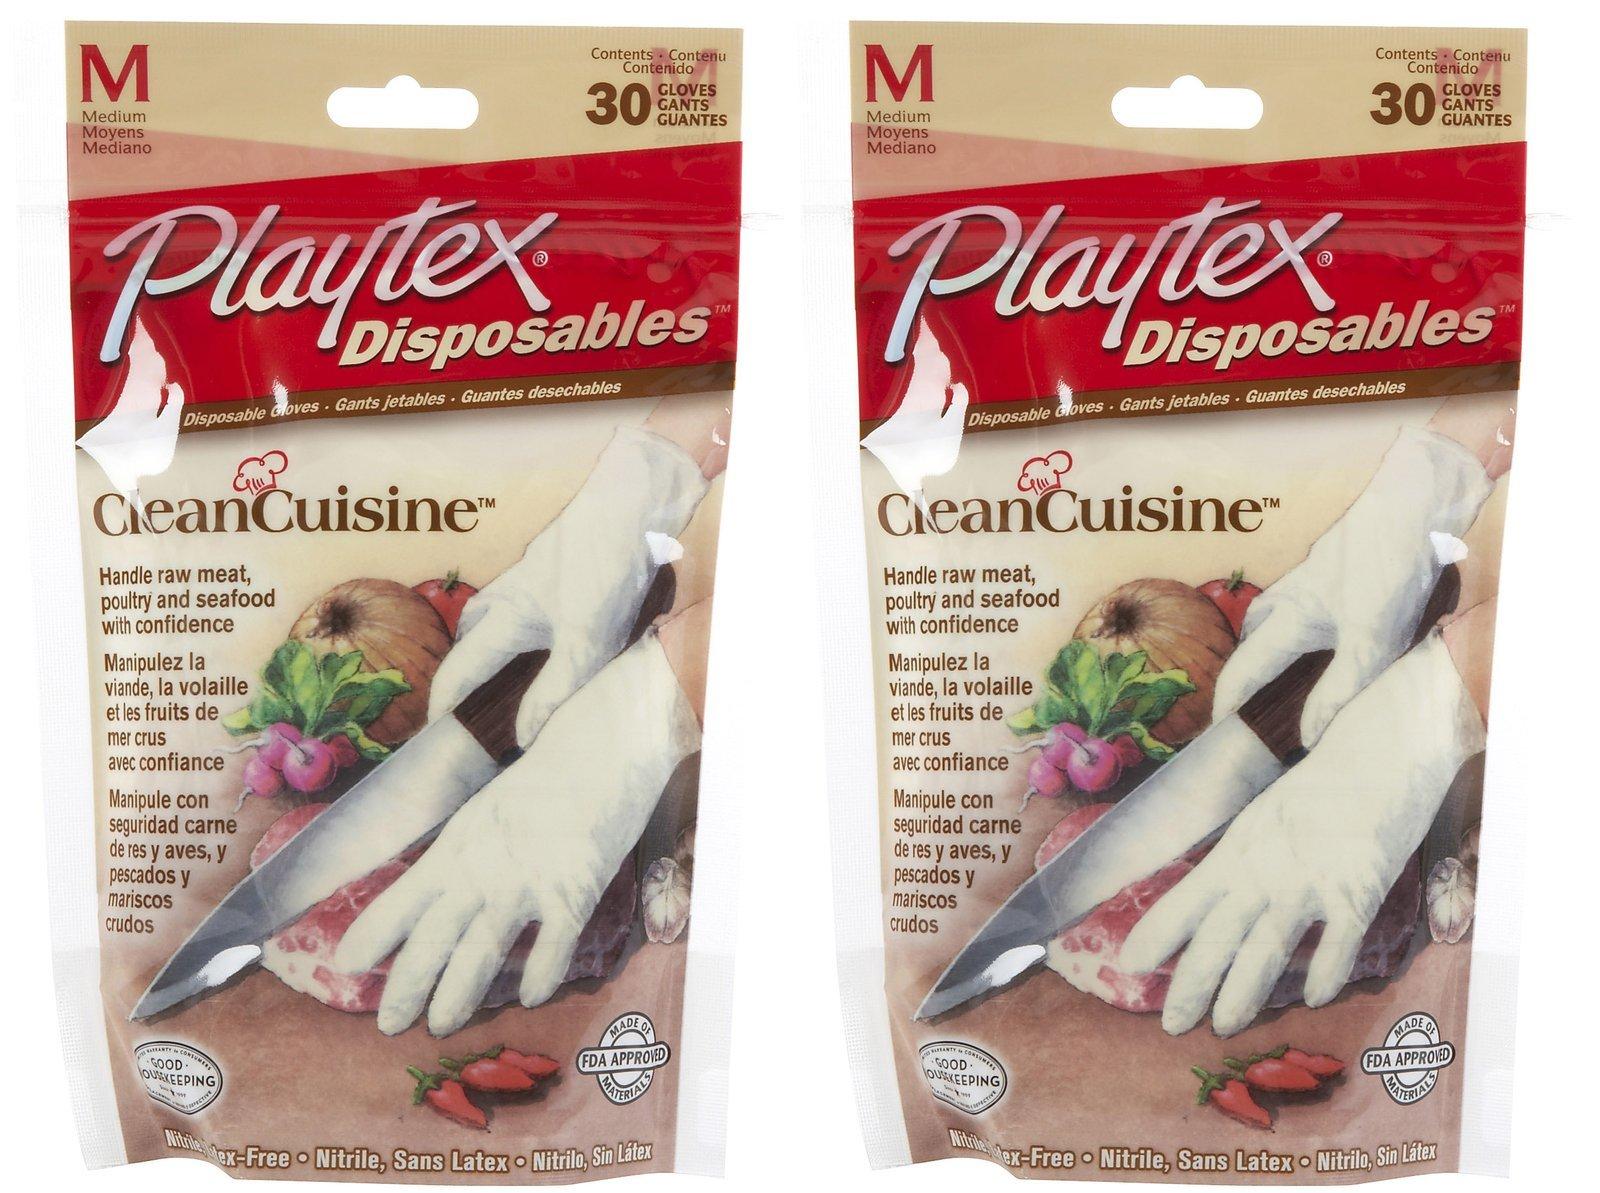 Playtex Disposable Food Prep Gloves - 30 ct - 2 pk